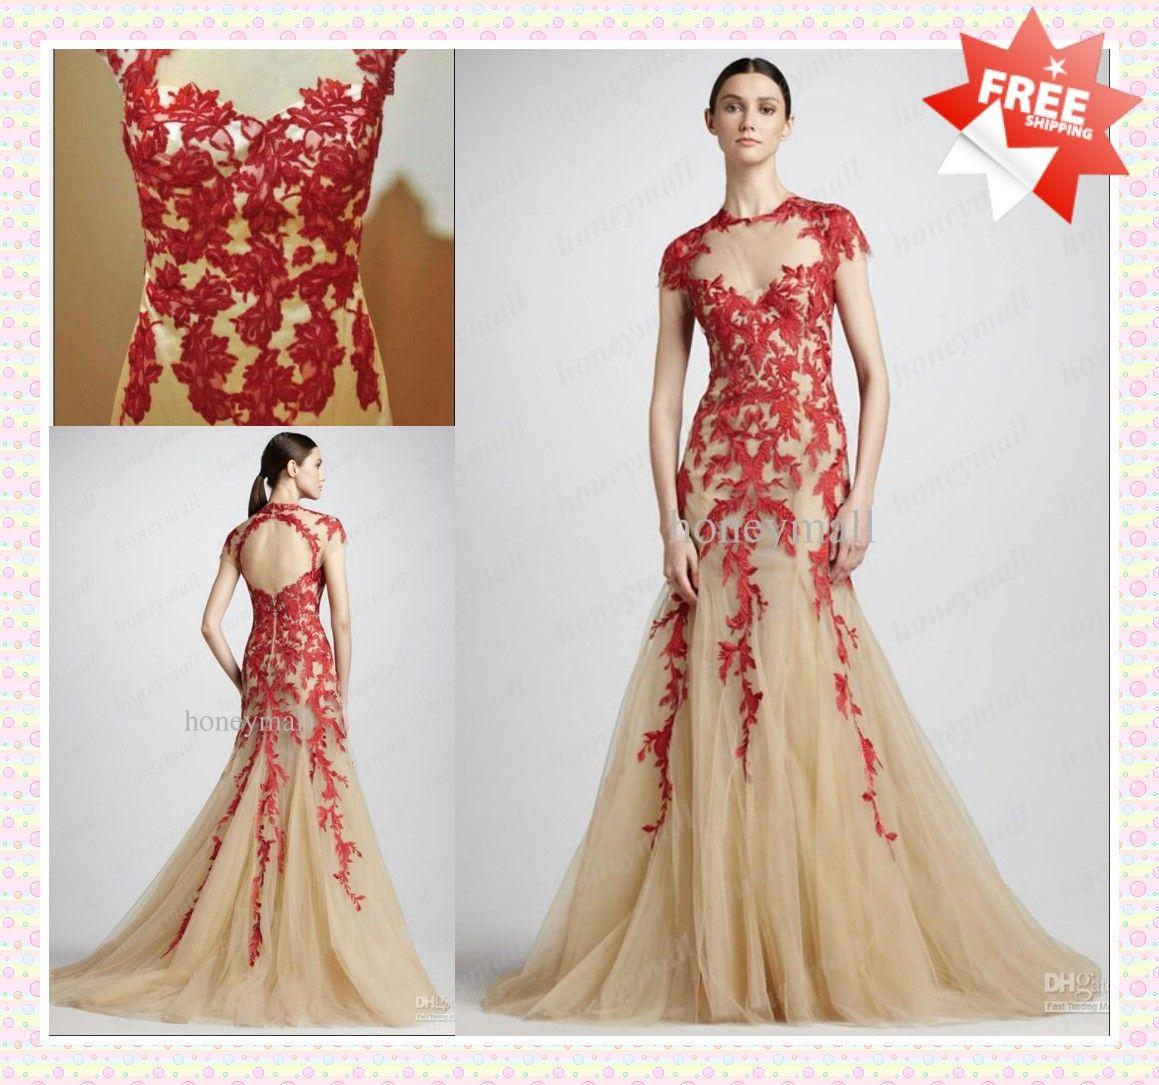 Red and Champagne Wedding Dress_Wedding Dresses_dressesss